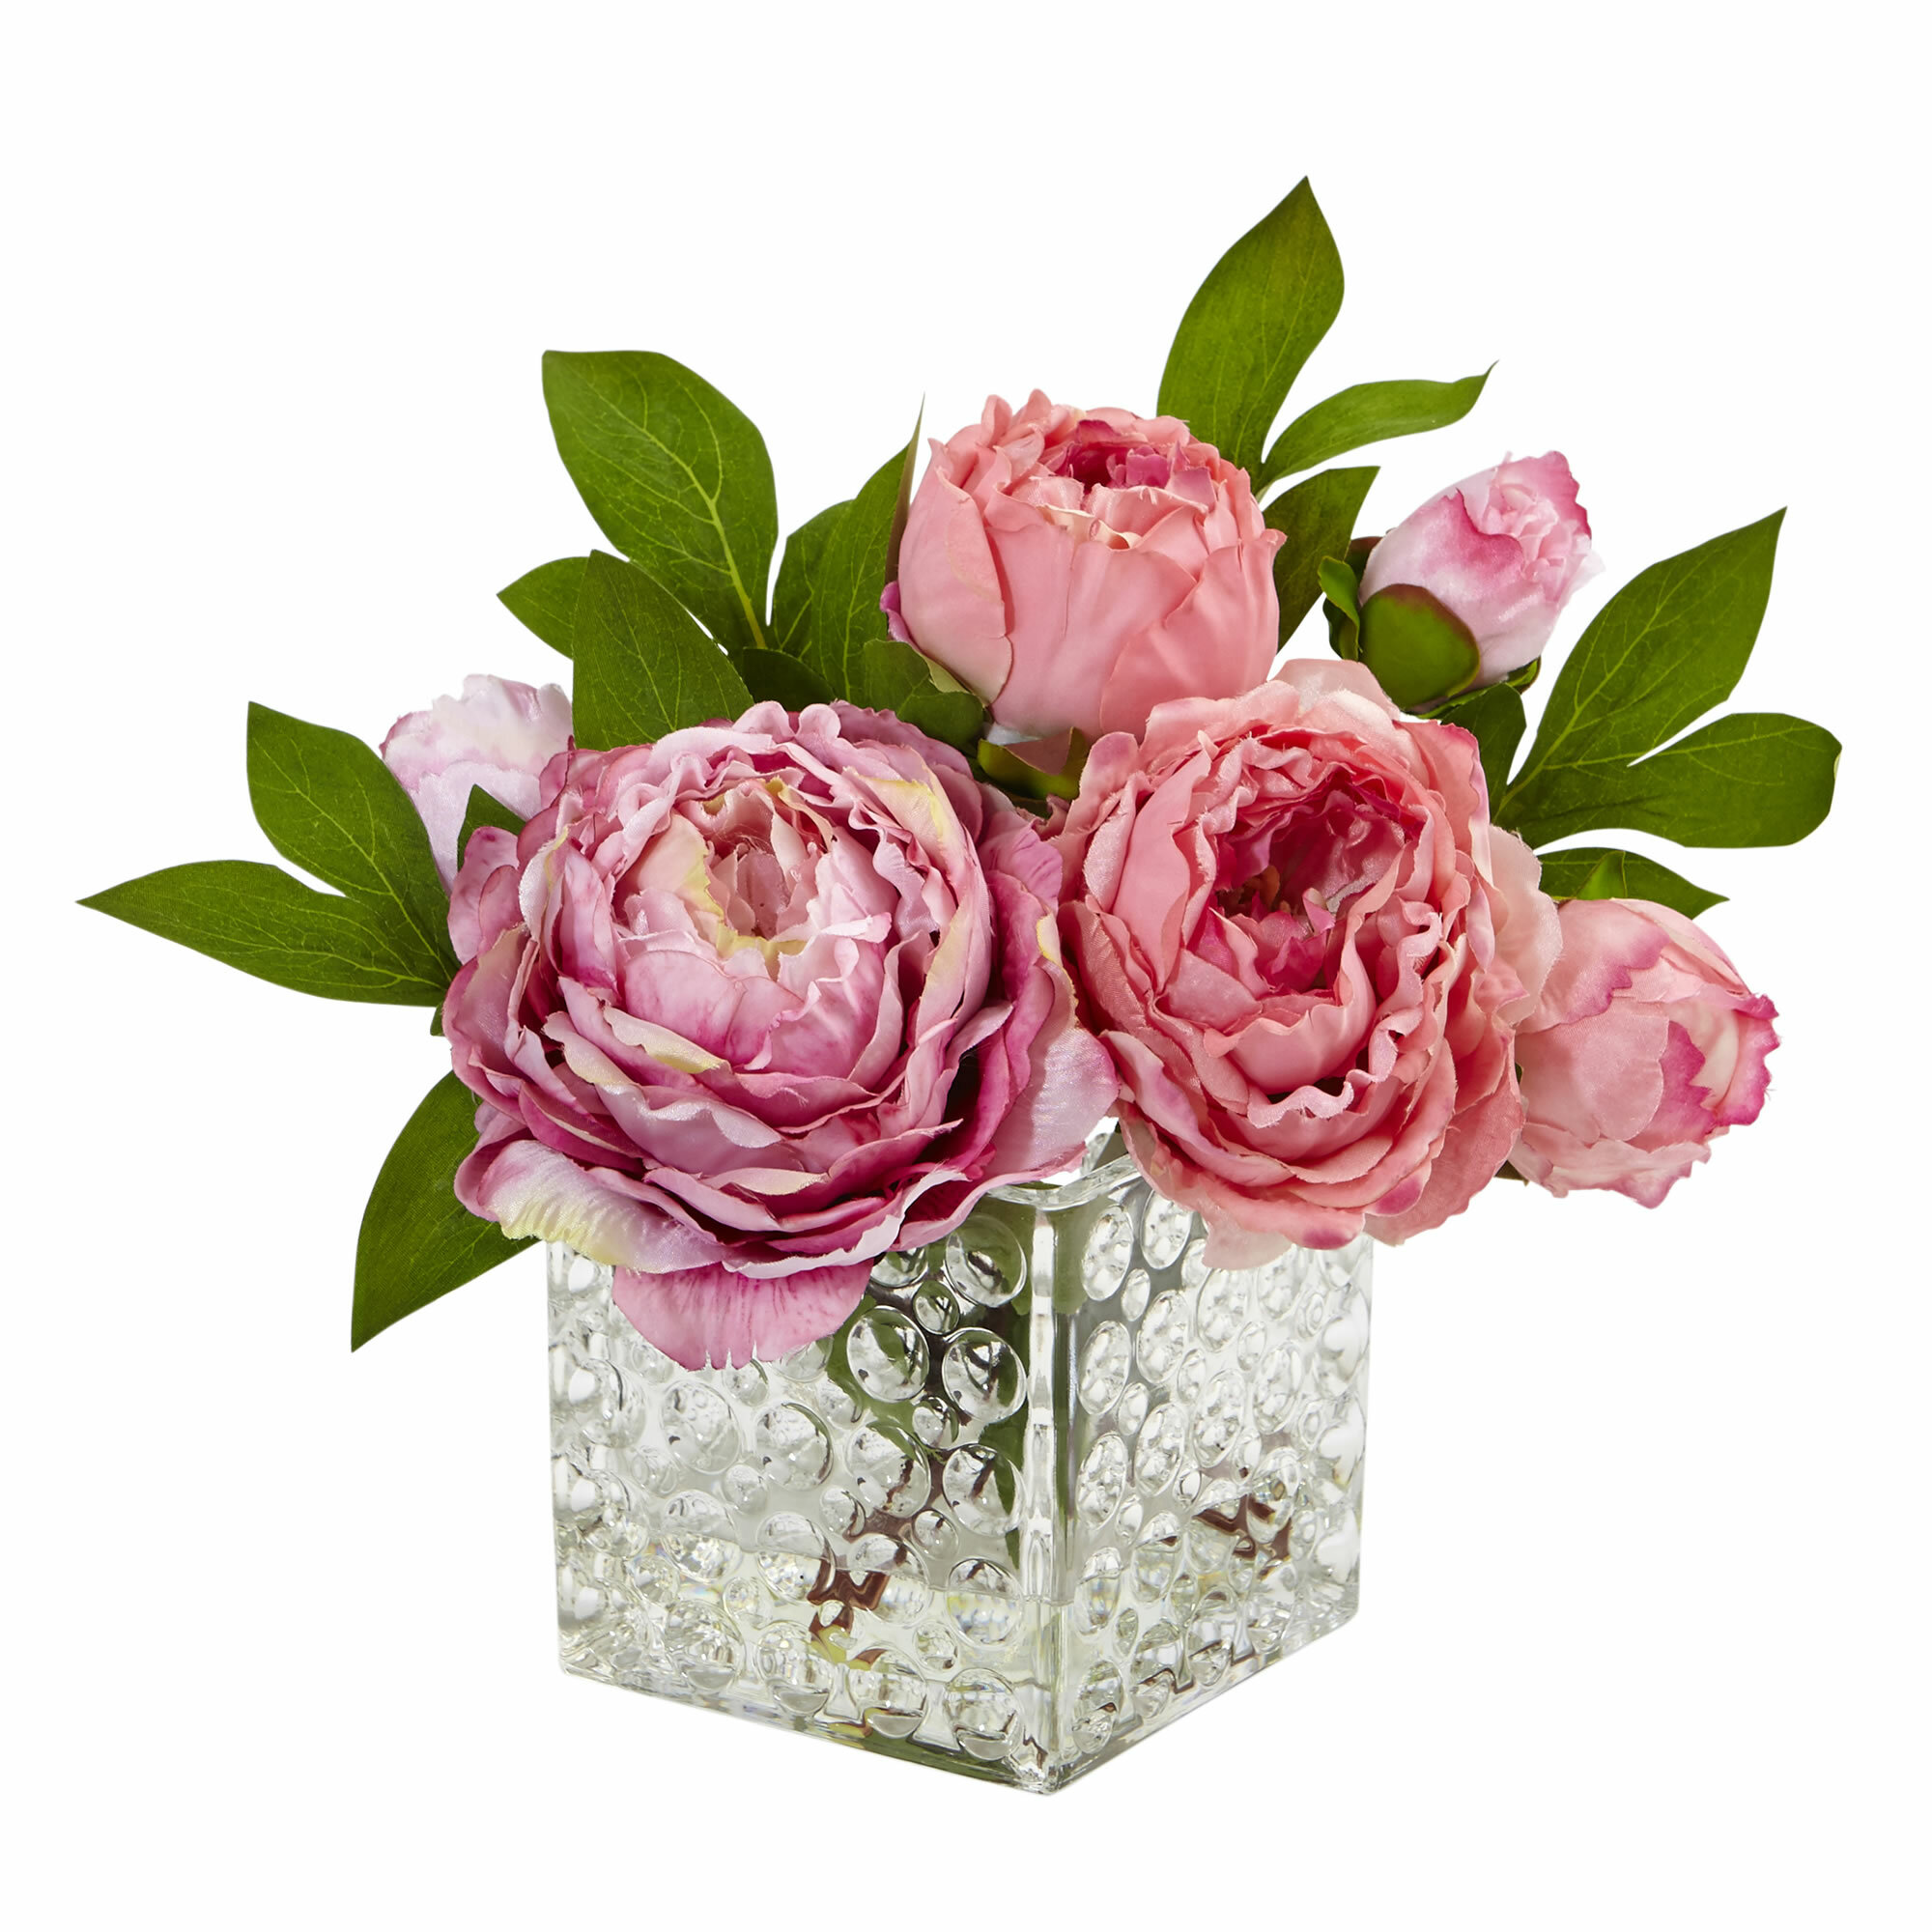 Peony floral arrangements in decorative vase reviews joss main